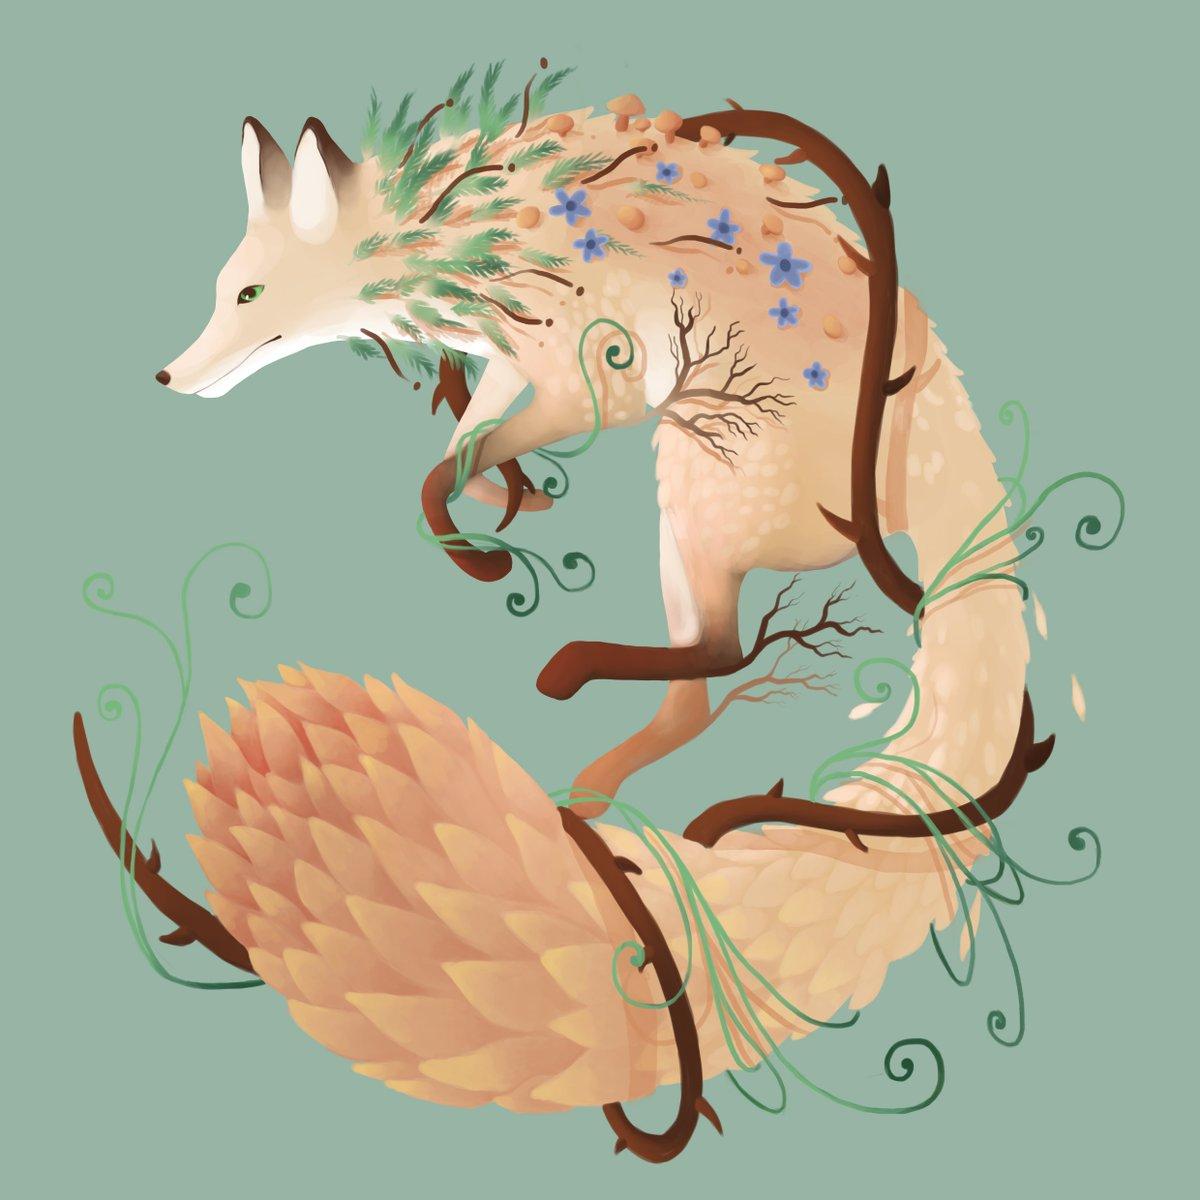 petit renard plantouilleux ^^ #renard #plantes #feuille #ronce #fleus #animals #animalsauvage #illustation #branches<br>http://pic.twitter.com/iueurb9XVs